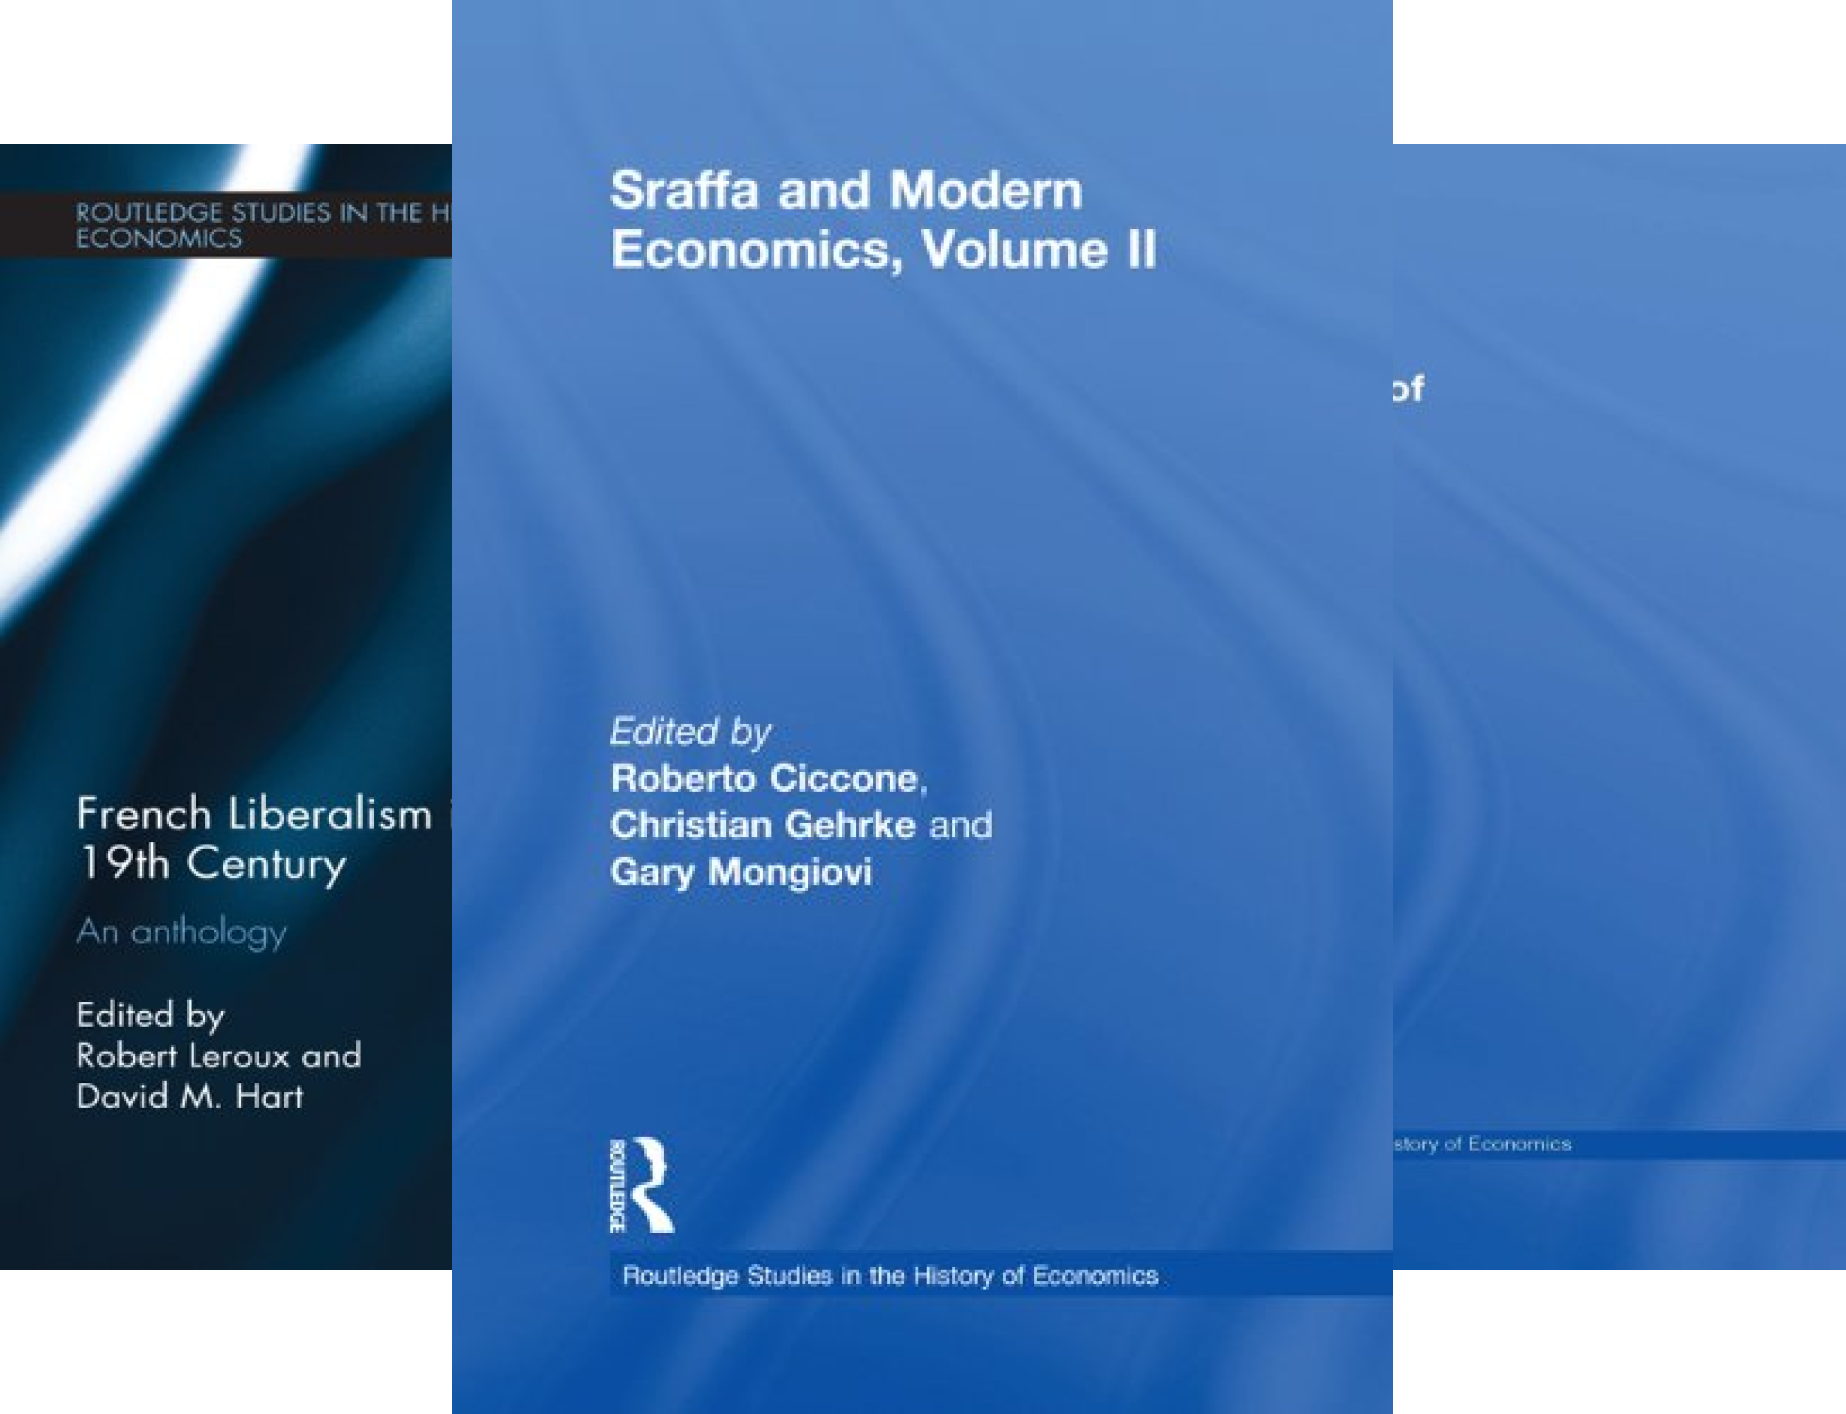 Routledge Studies in the History of Economics